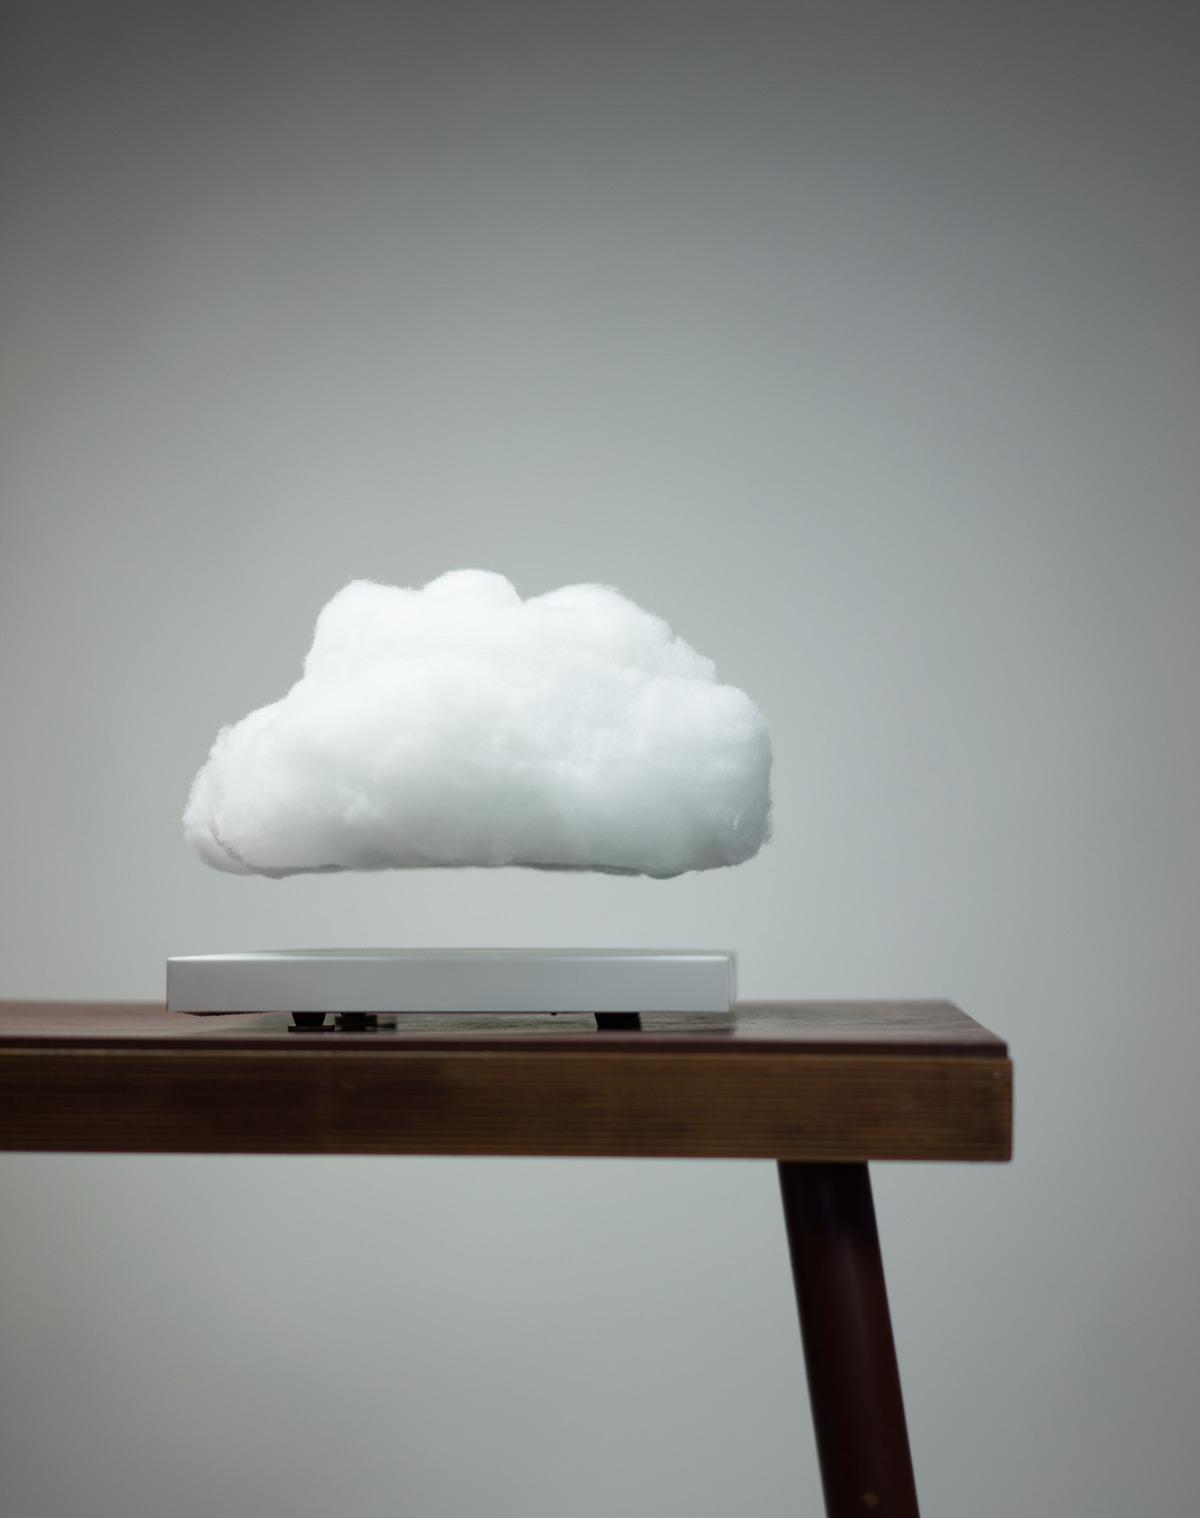 floating cloud moss and fog 4